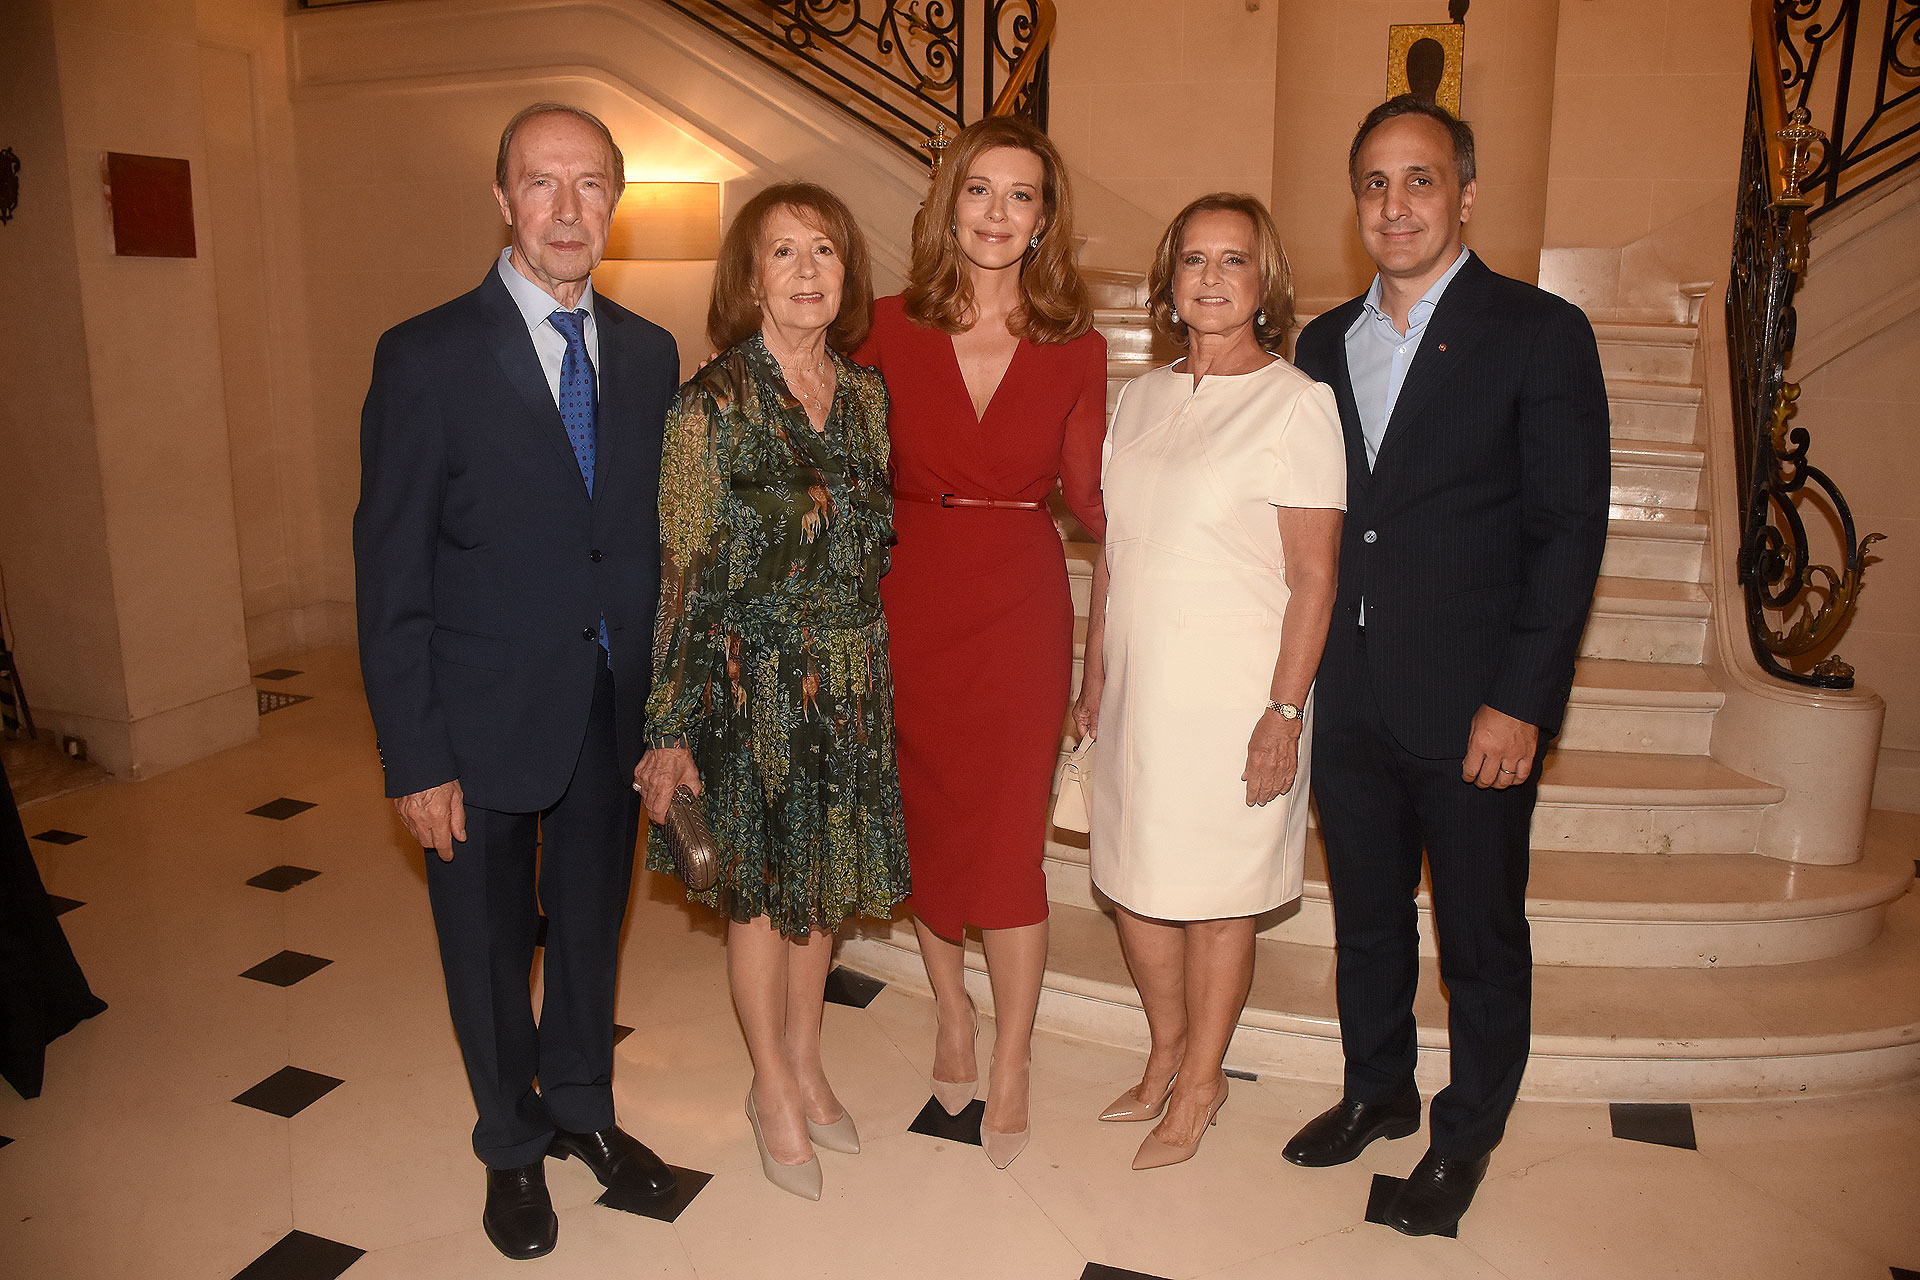 Osvaldo, María, Nunzia Locatelli, Teresa y Marcos Bulgheroni